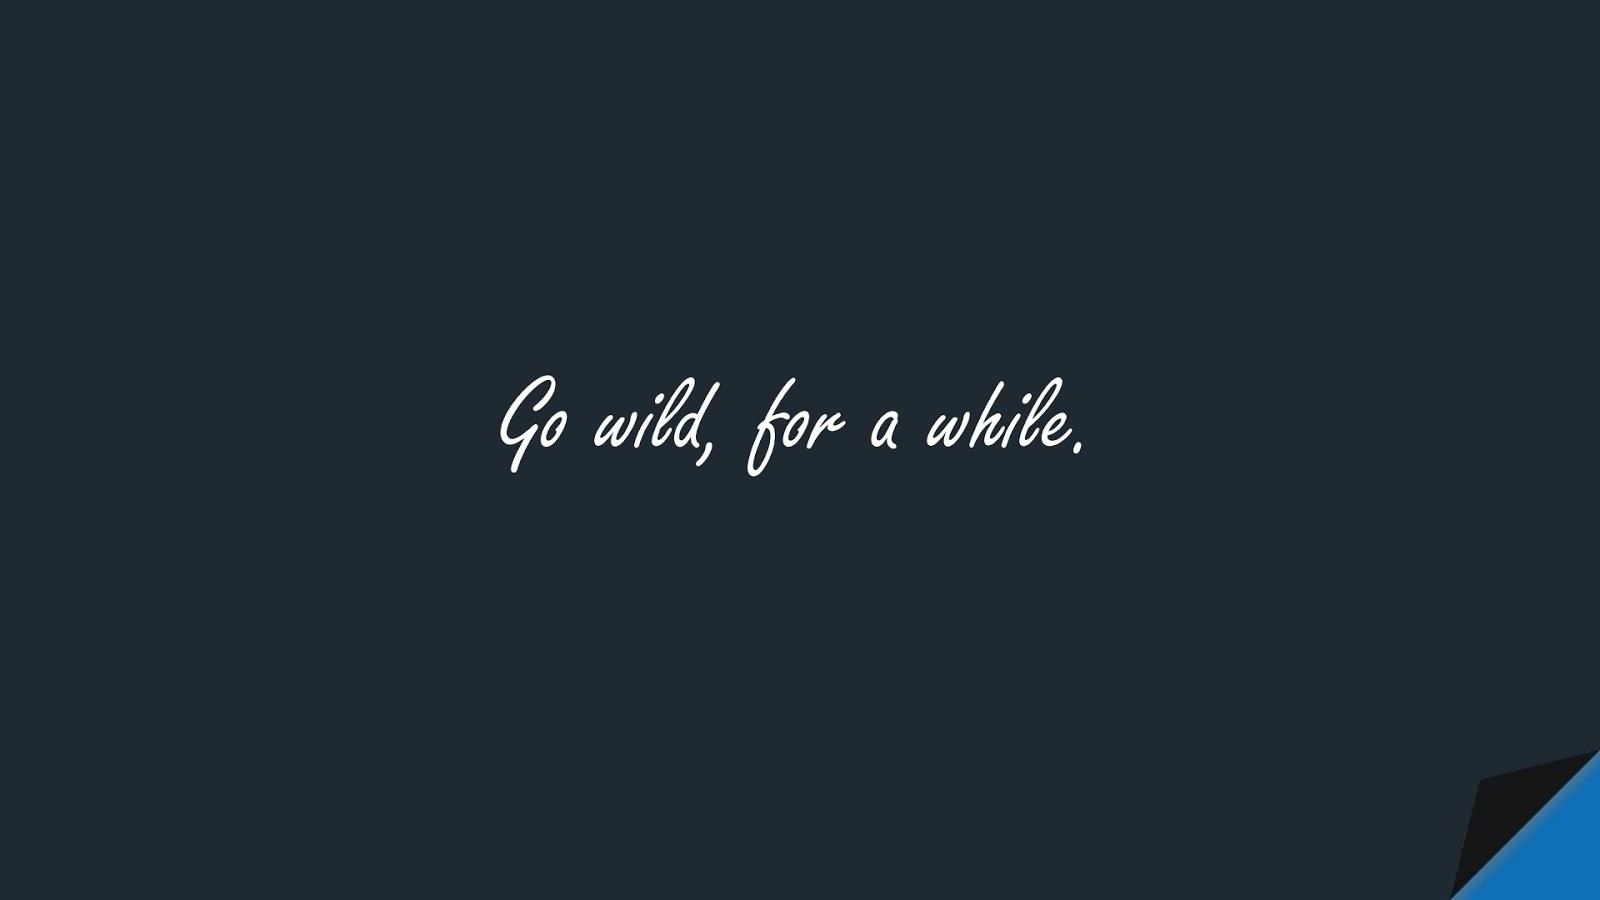 Go wild, for a while.FALSE